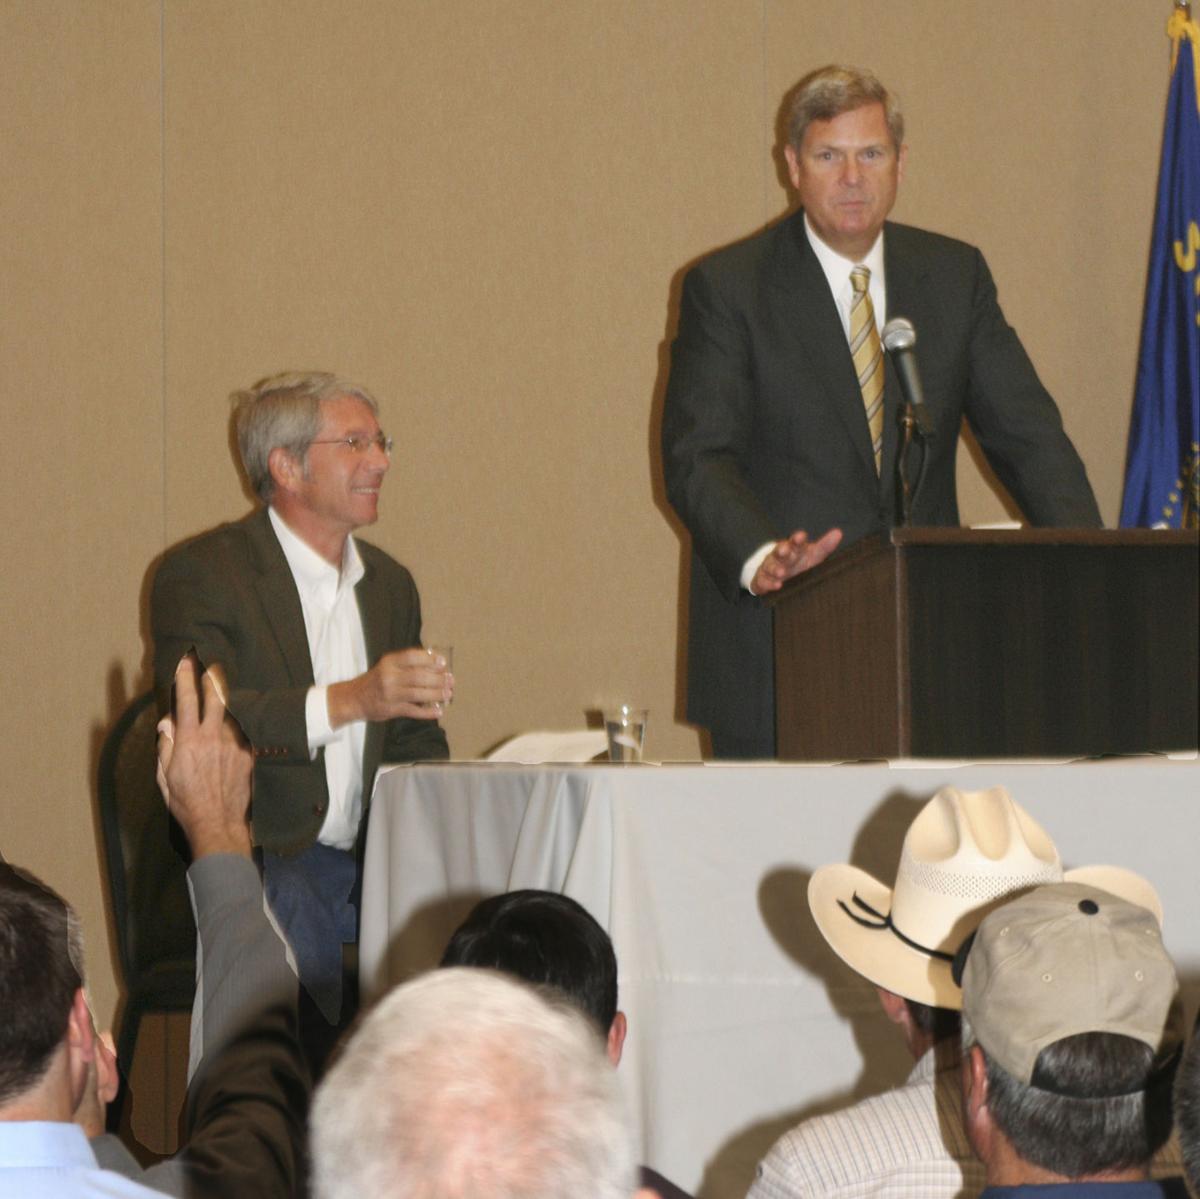 Ag secretary touts rural development in Oregon visit